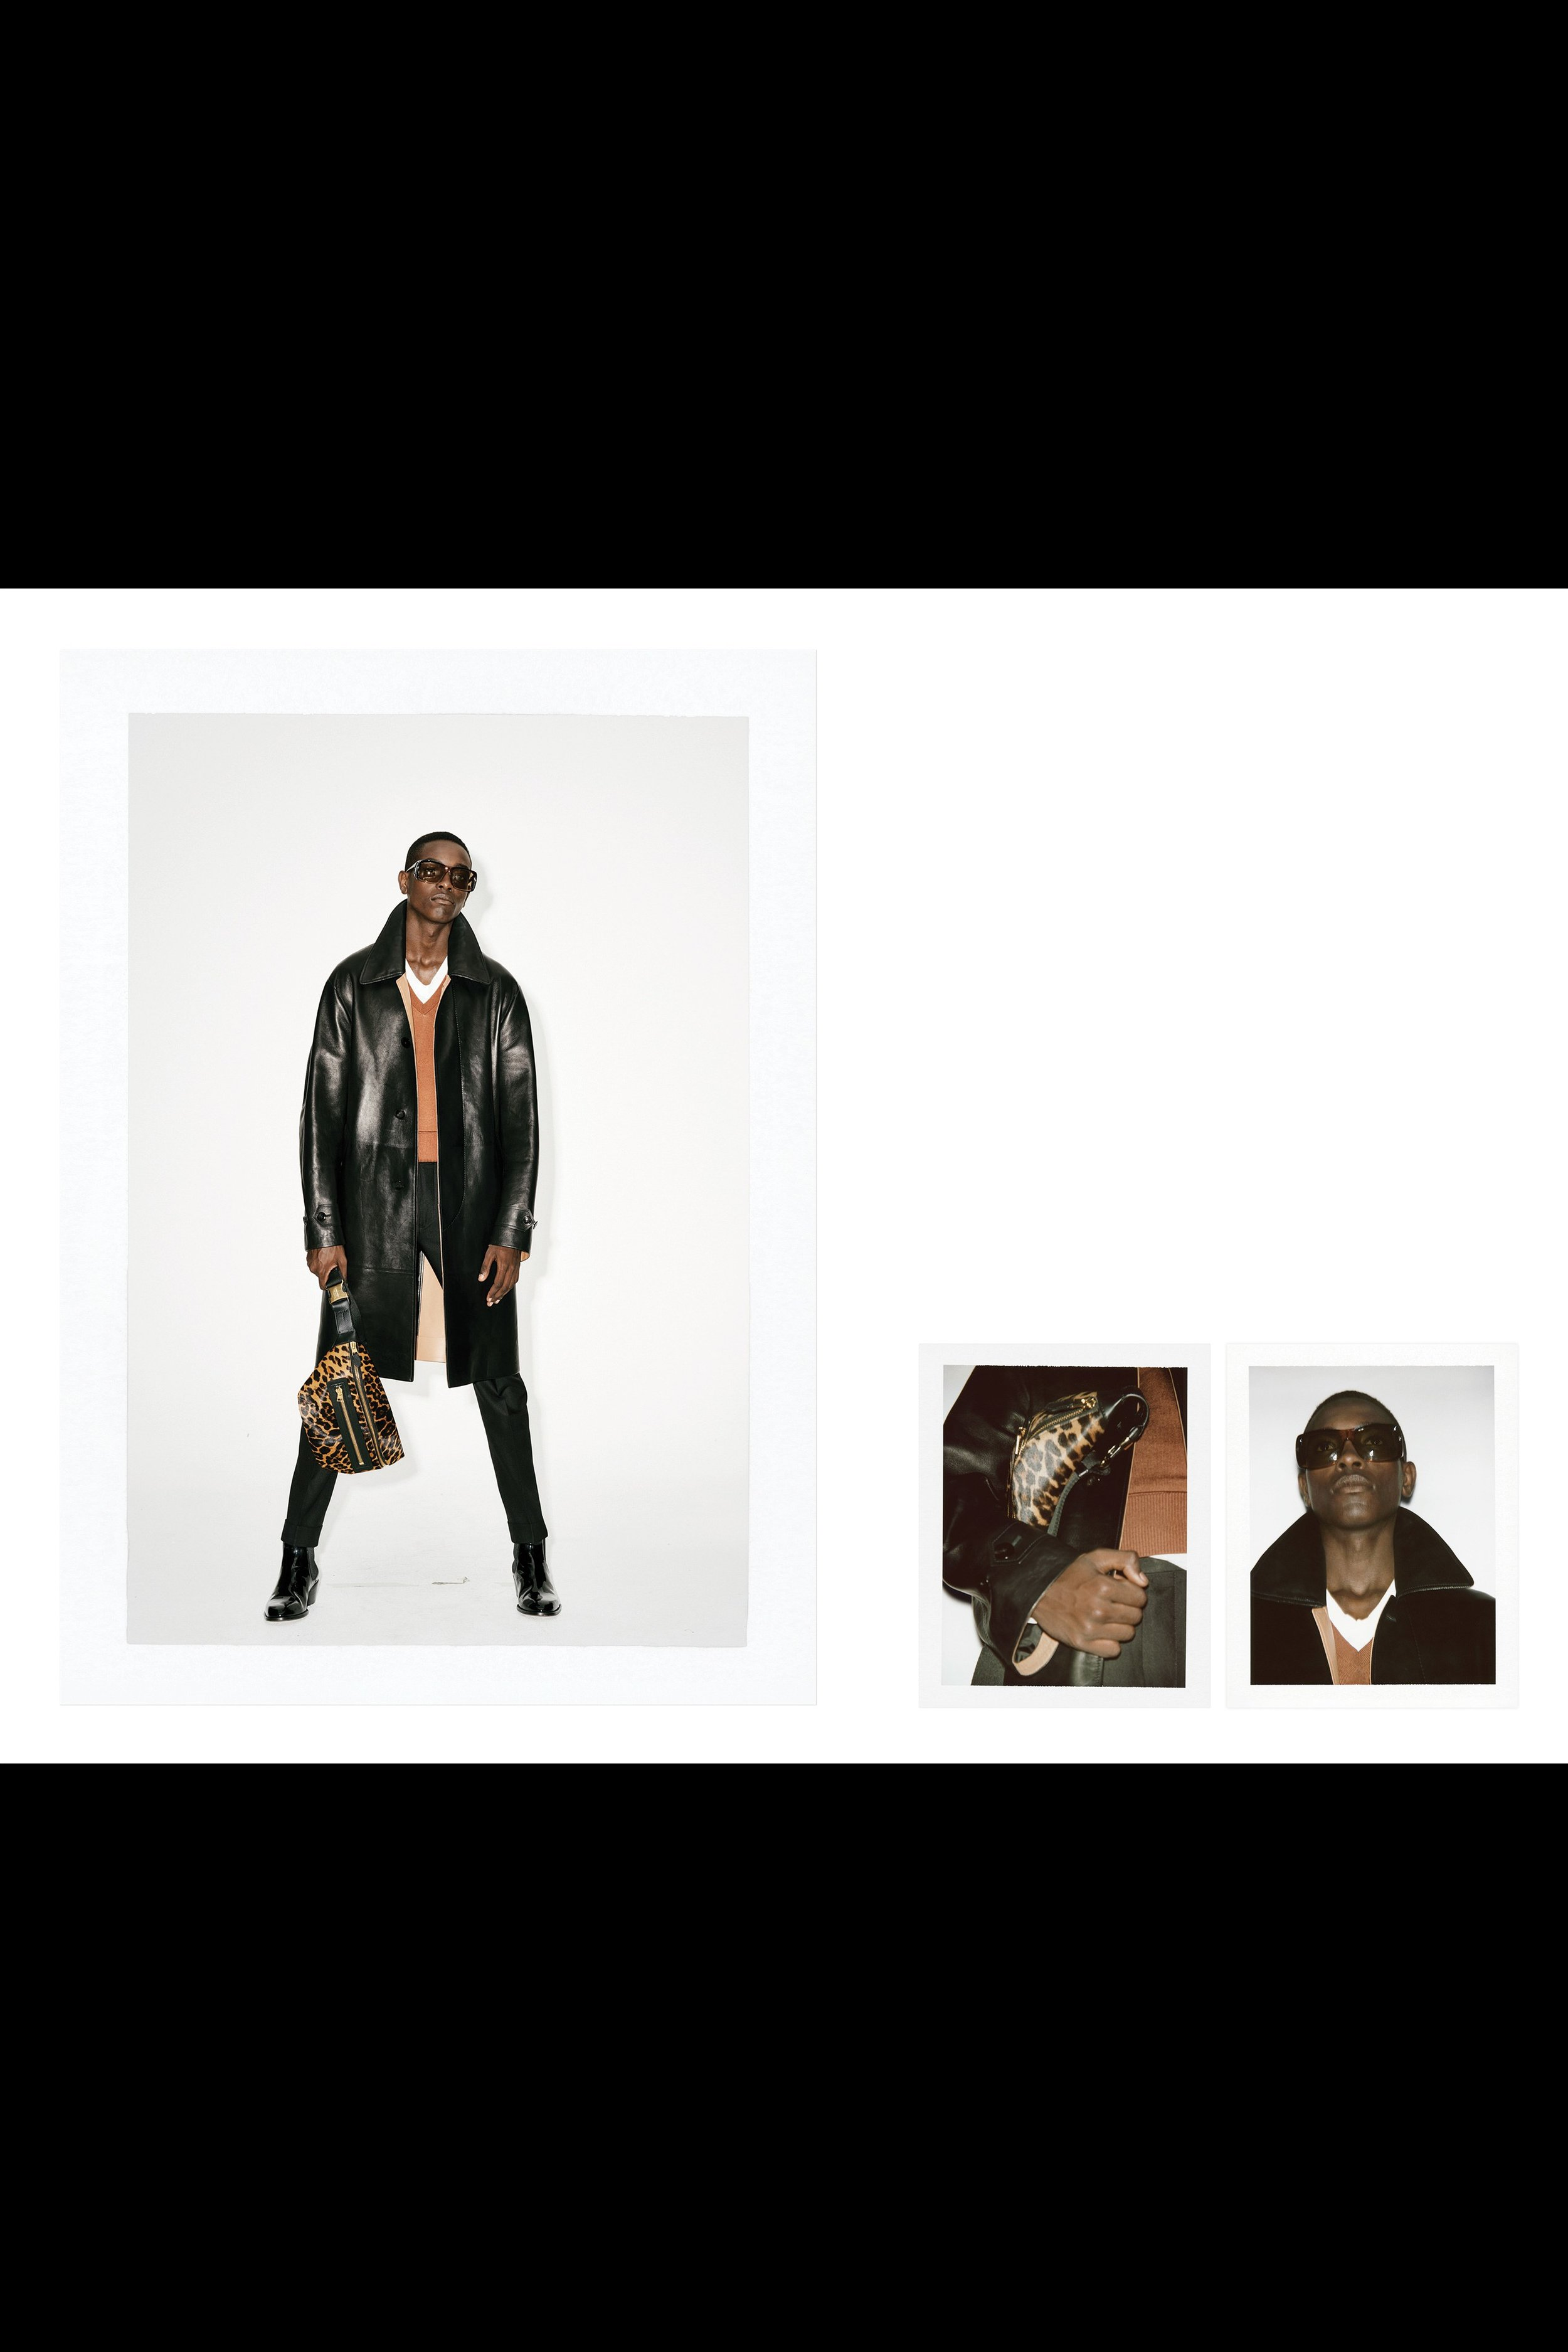 00026-Tom-Ford-vogue-menswear-spring-2019-pr.jpg